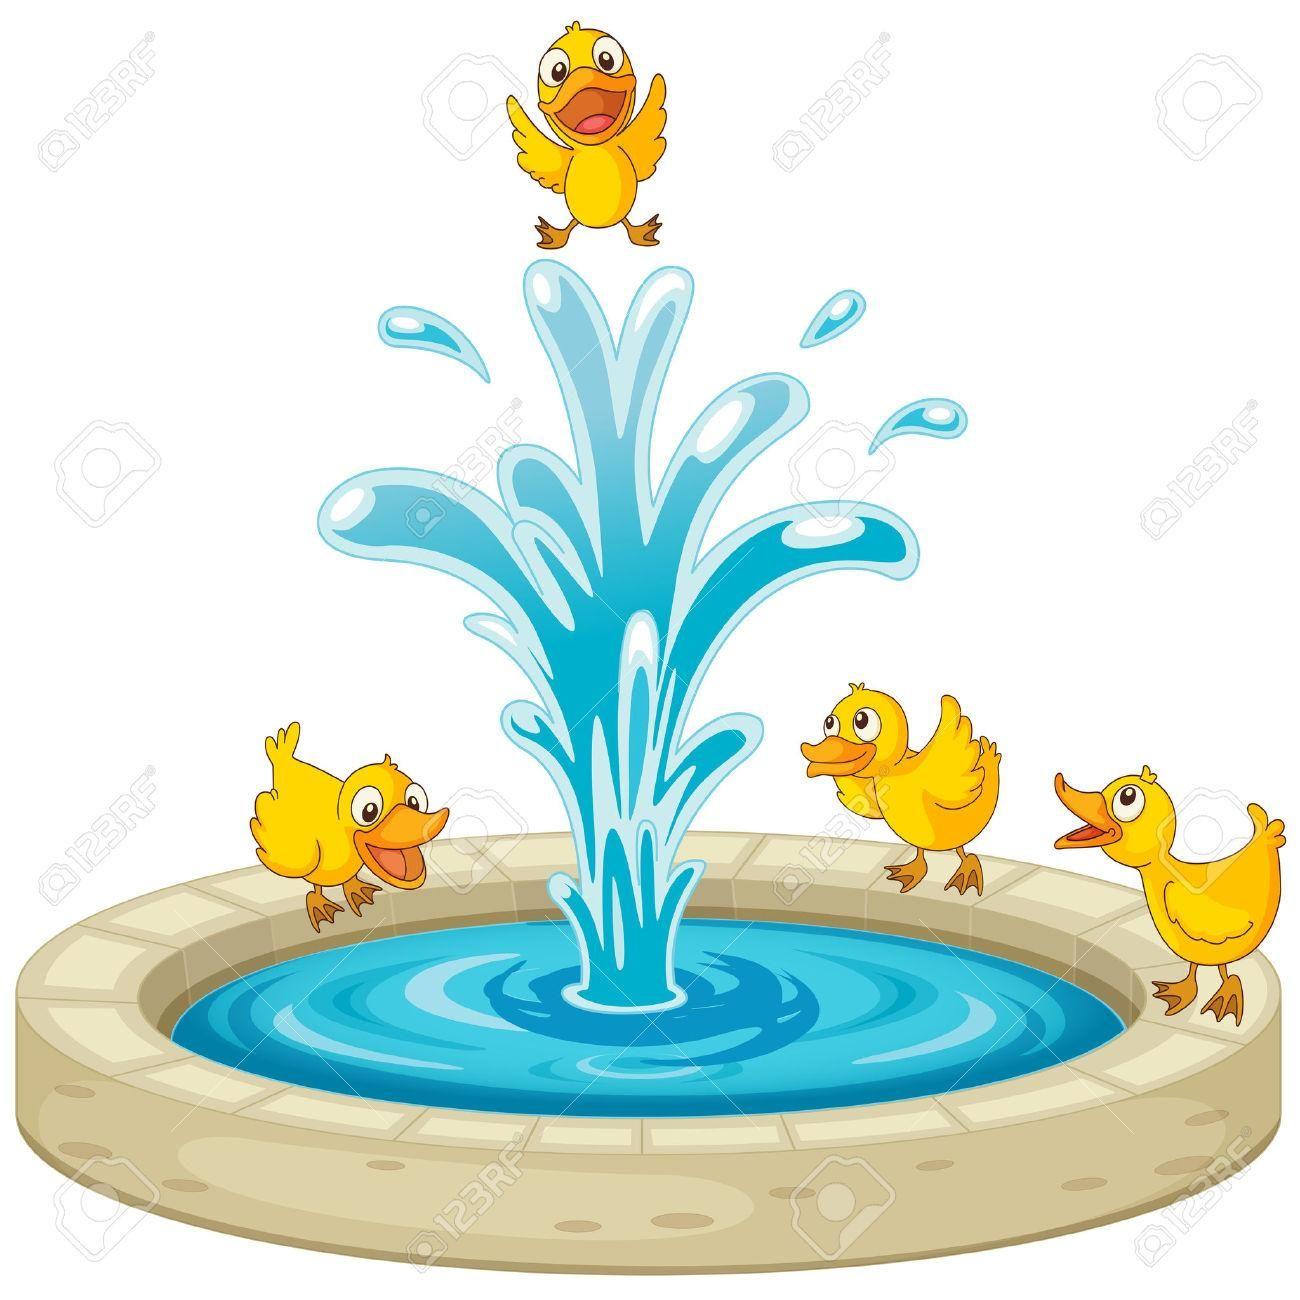 Water Fountain Clip Art Illustration Of Ducks And Fountain Fountain Water Water Fountain Clip Art Illustration